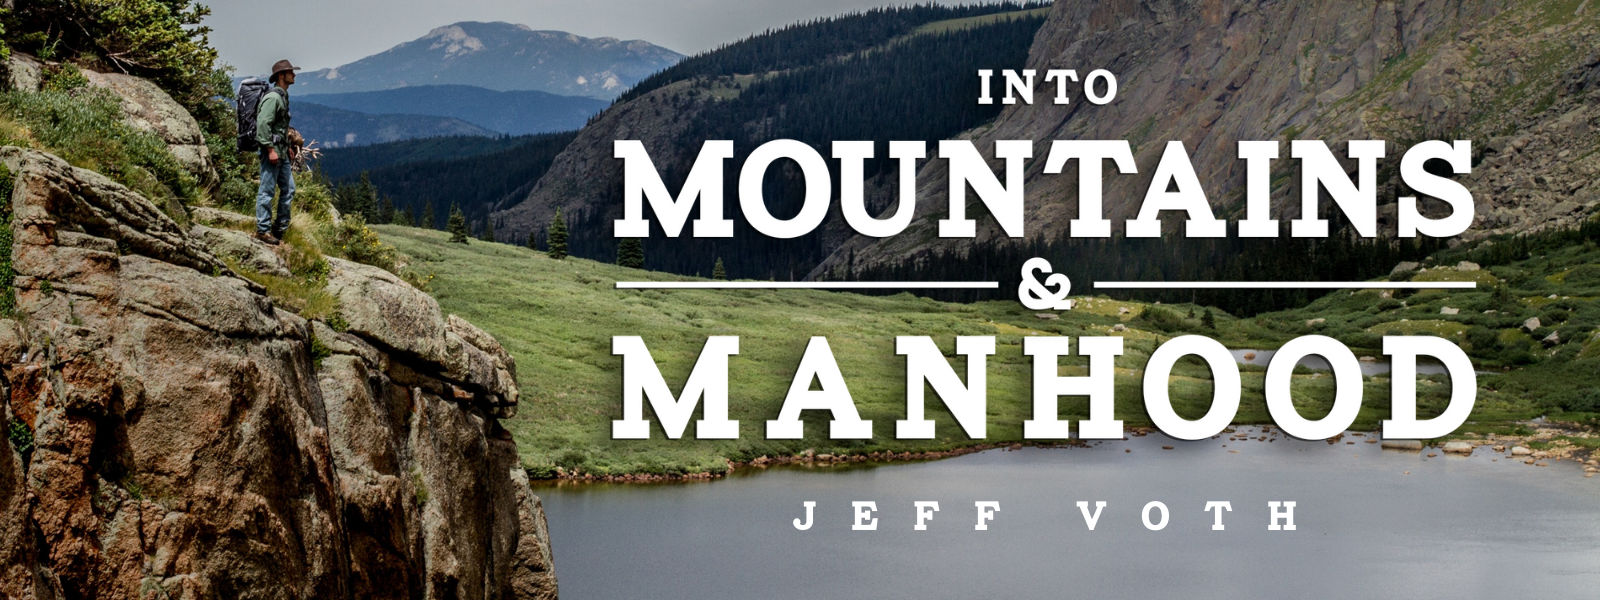 Into Mountains & Manhood